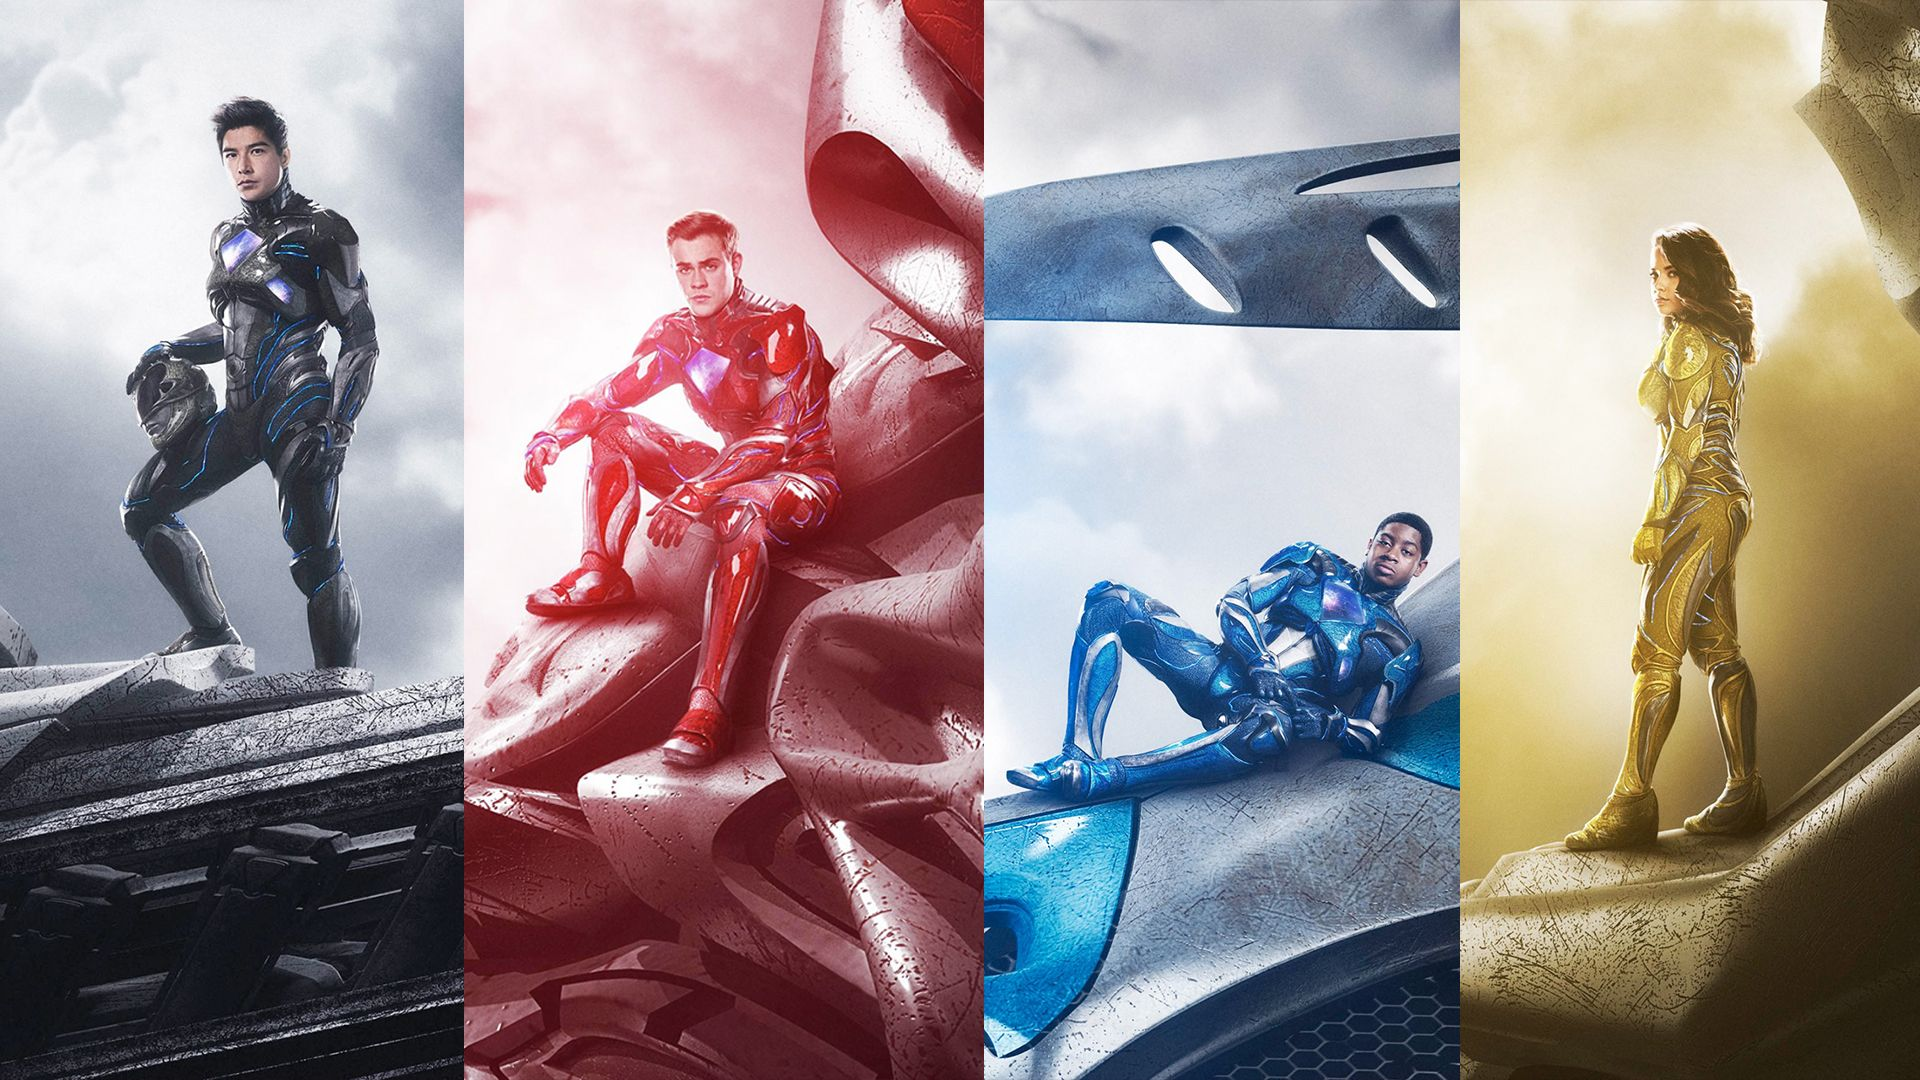 Power Rangers 2017 Wallpaper de filme HD 2427  wallpaperhitzcom 1920x1080